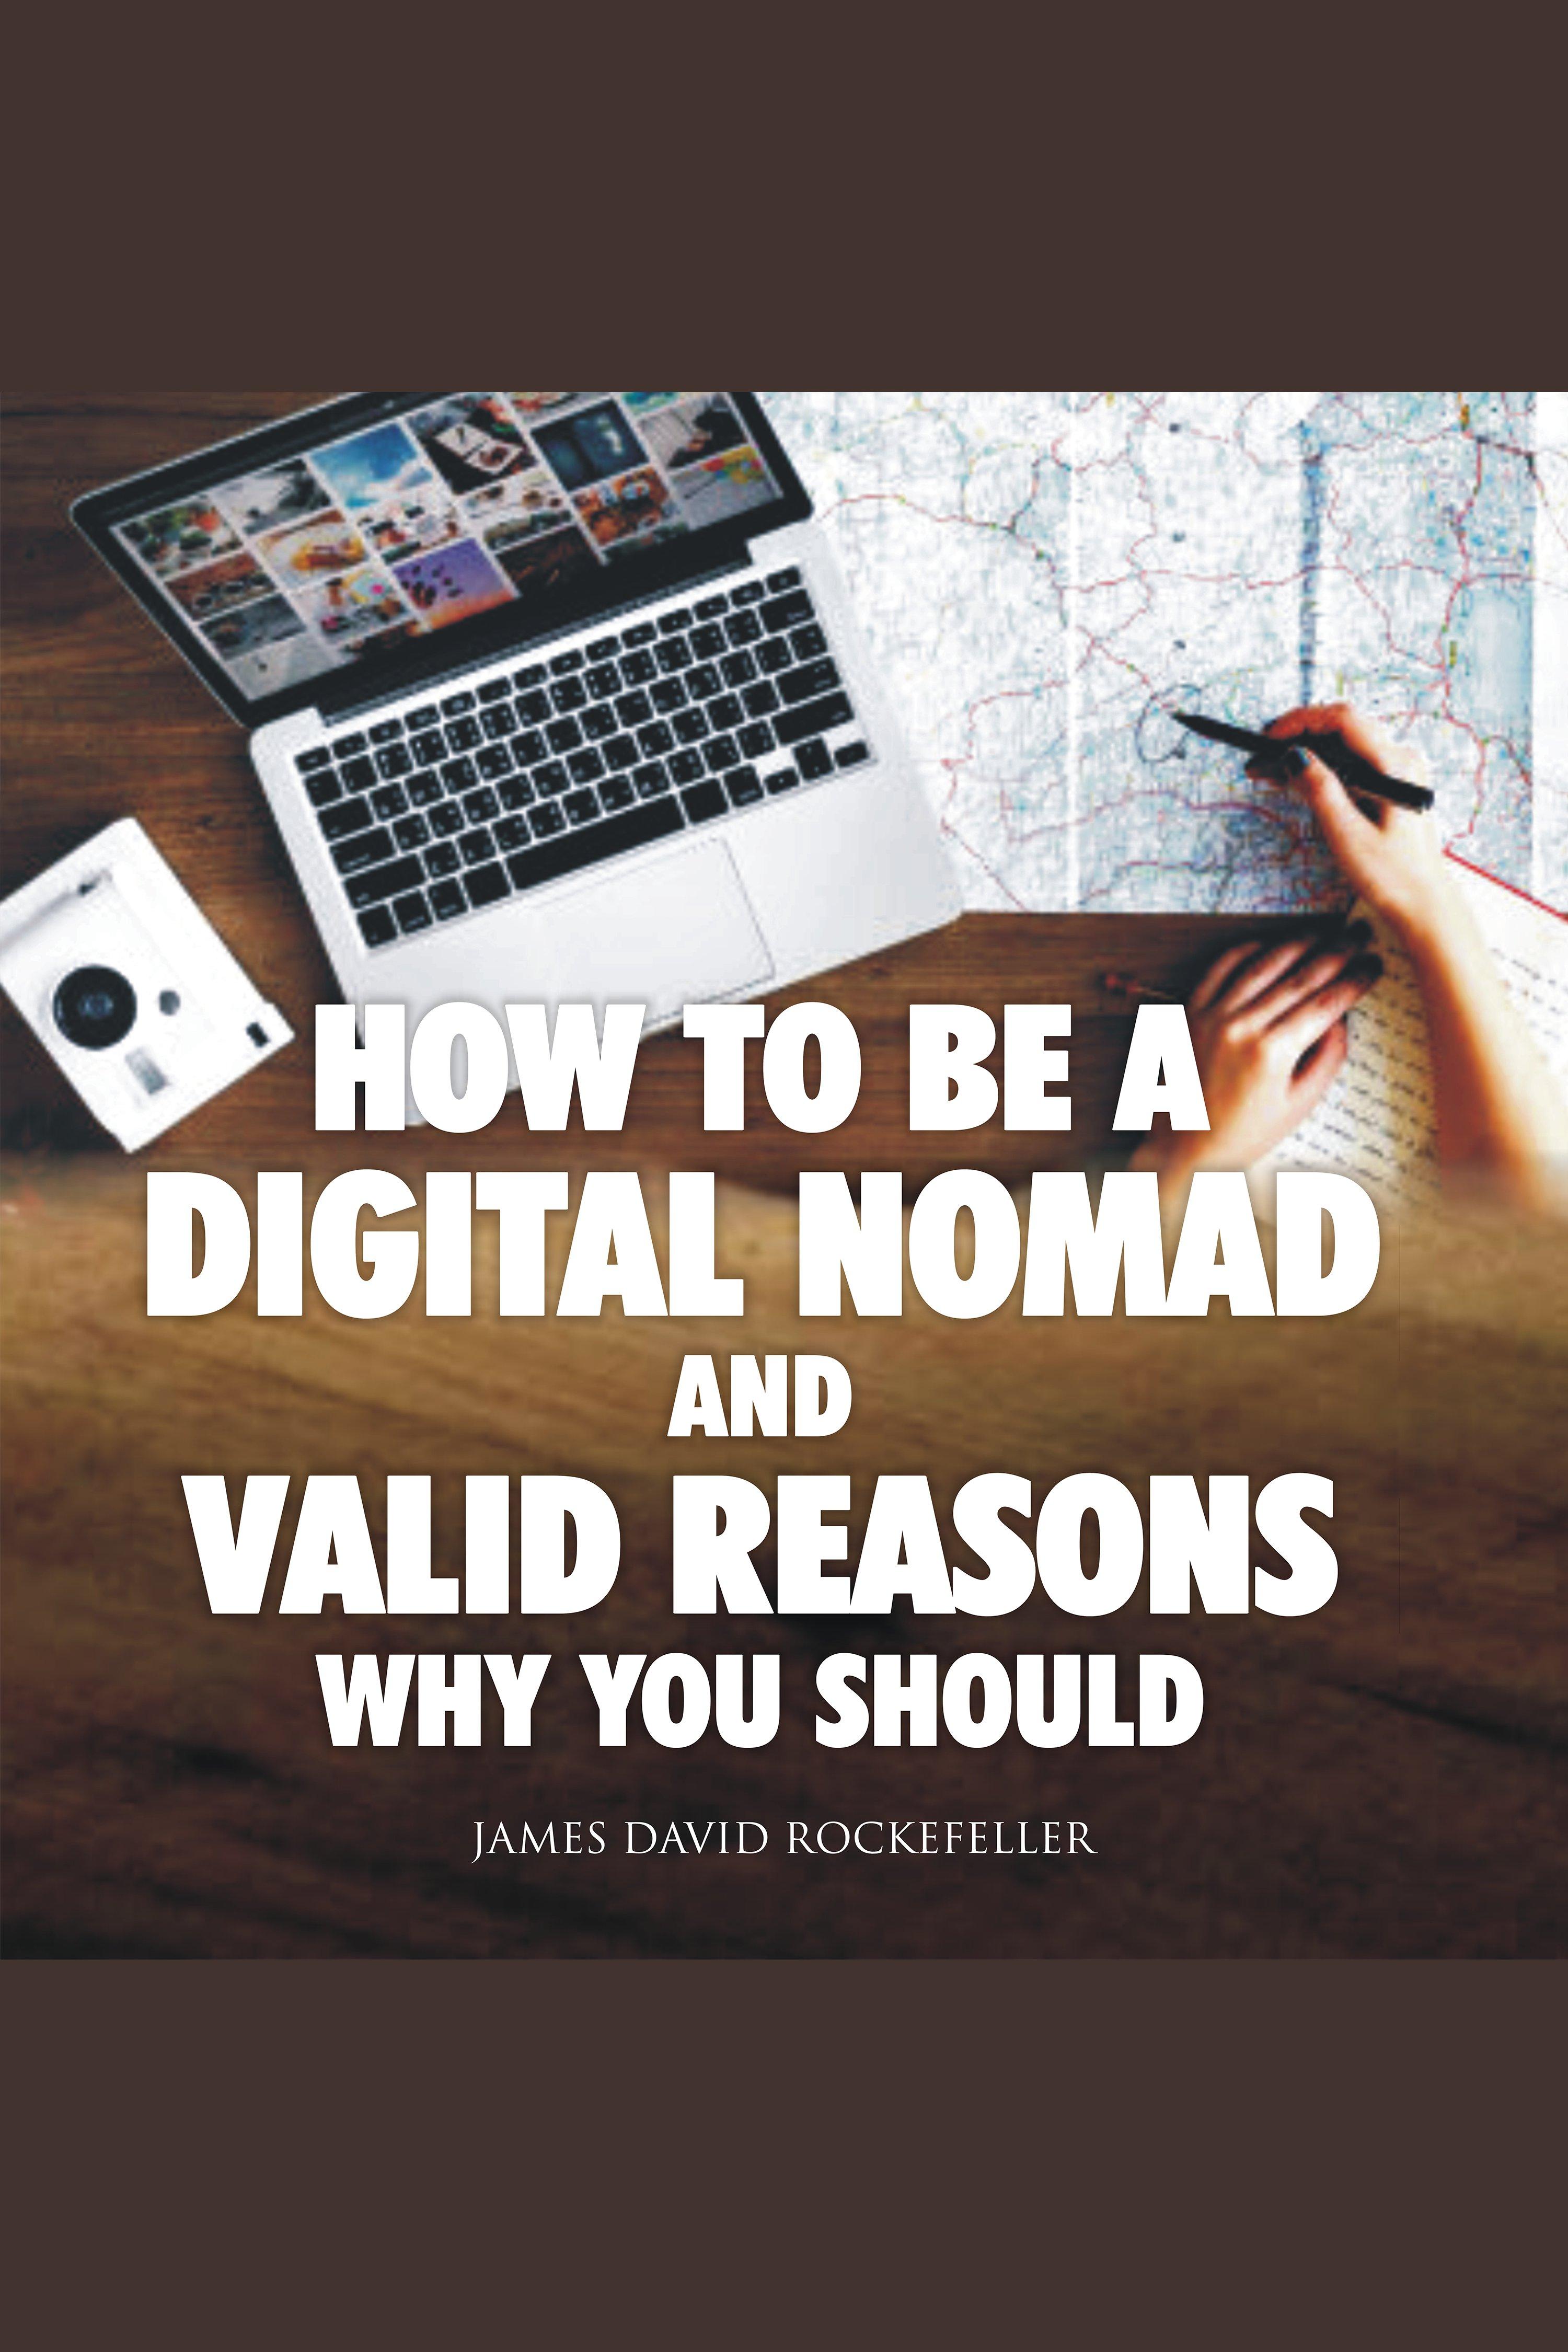 Esta es la portada del audiolibro How to Be a Digital Nomad and Valid Reasons Why You Should (AR)